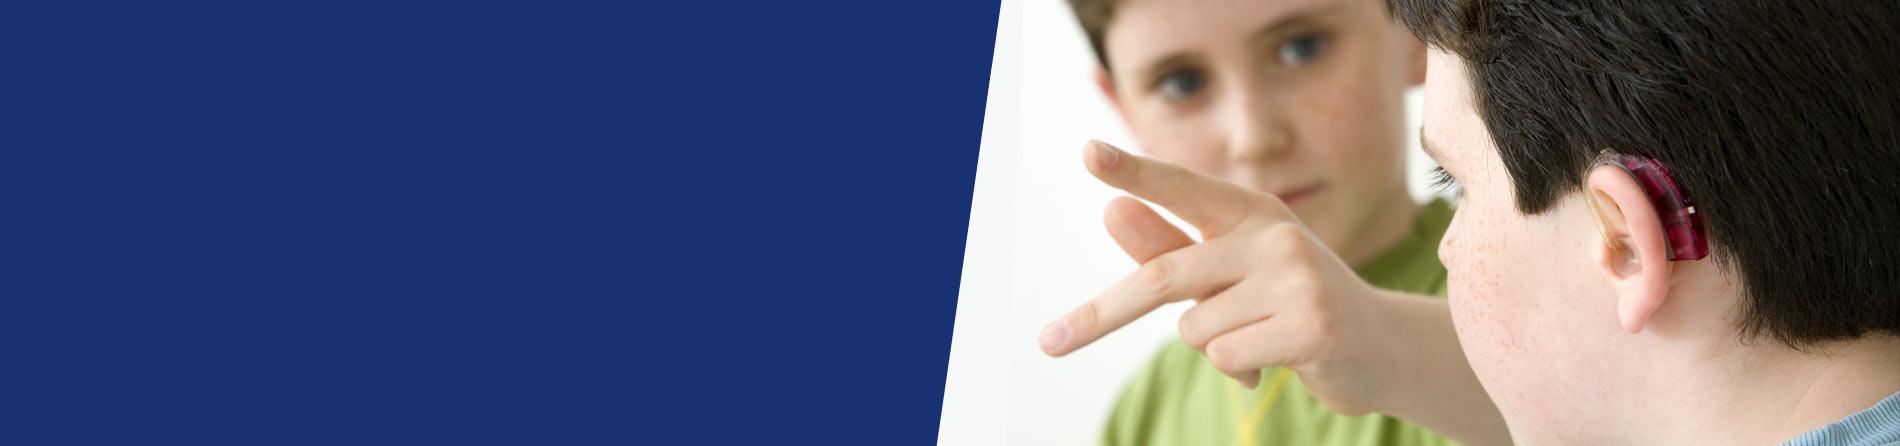 Deux enfants parlent en langage des signes